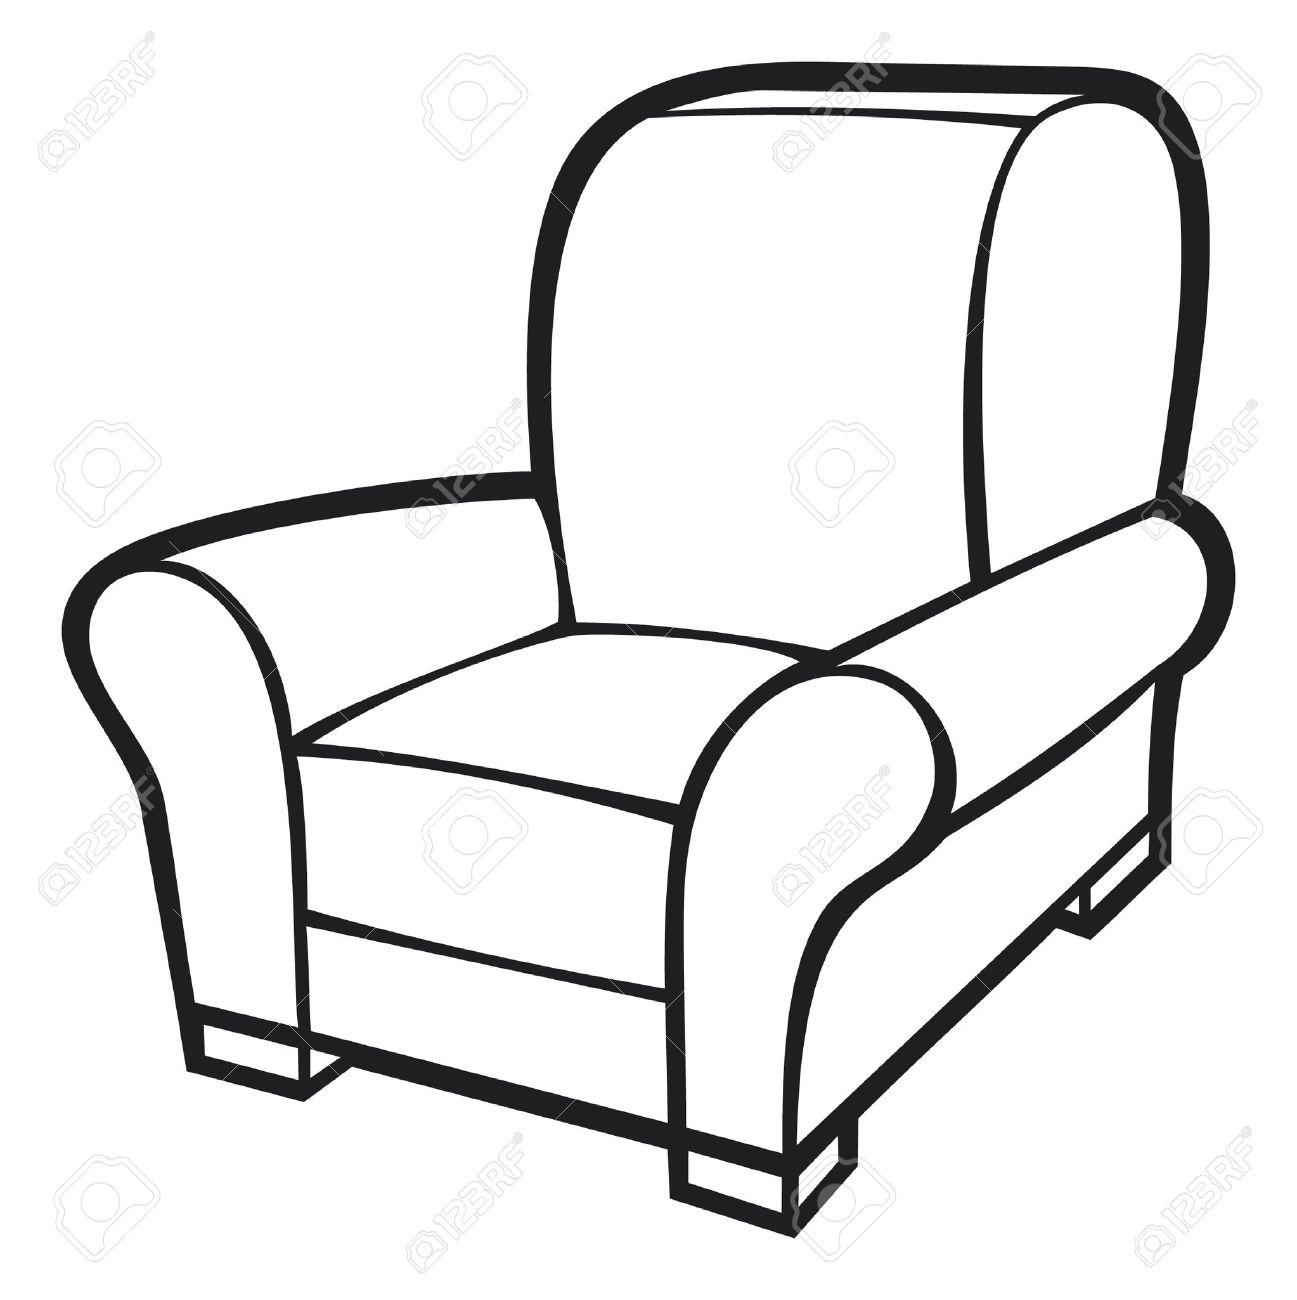 Sessel gezeichnet  Sessel Clipart | jject.info